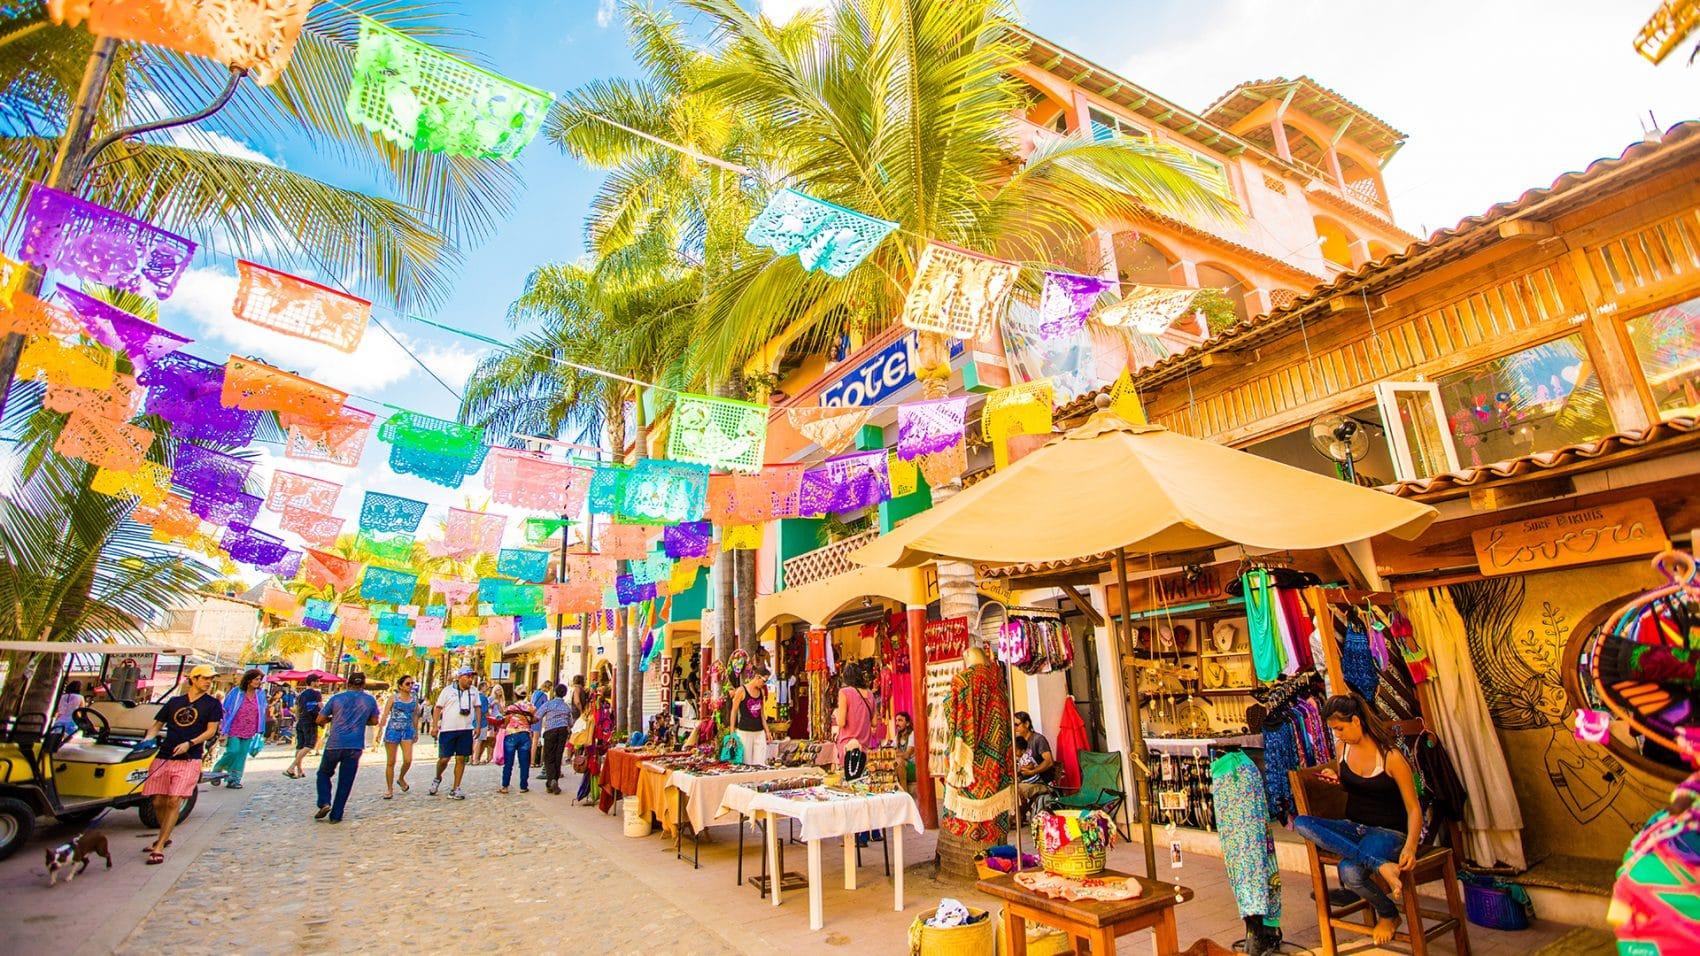 Colourful street market in Sayulita Rivera Nayarit